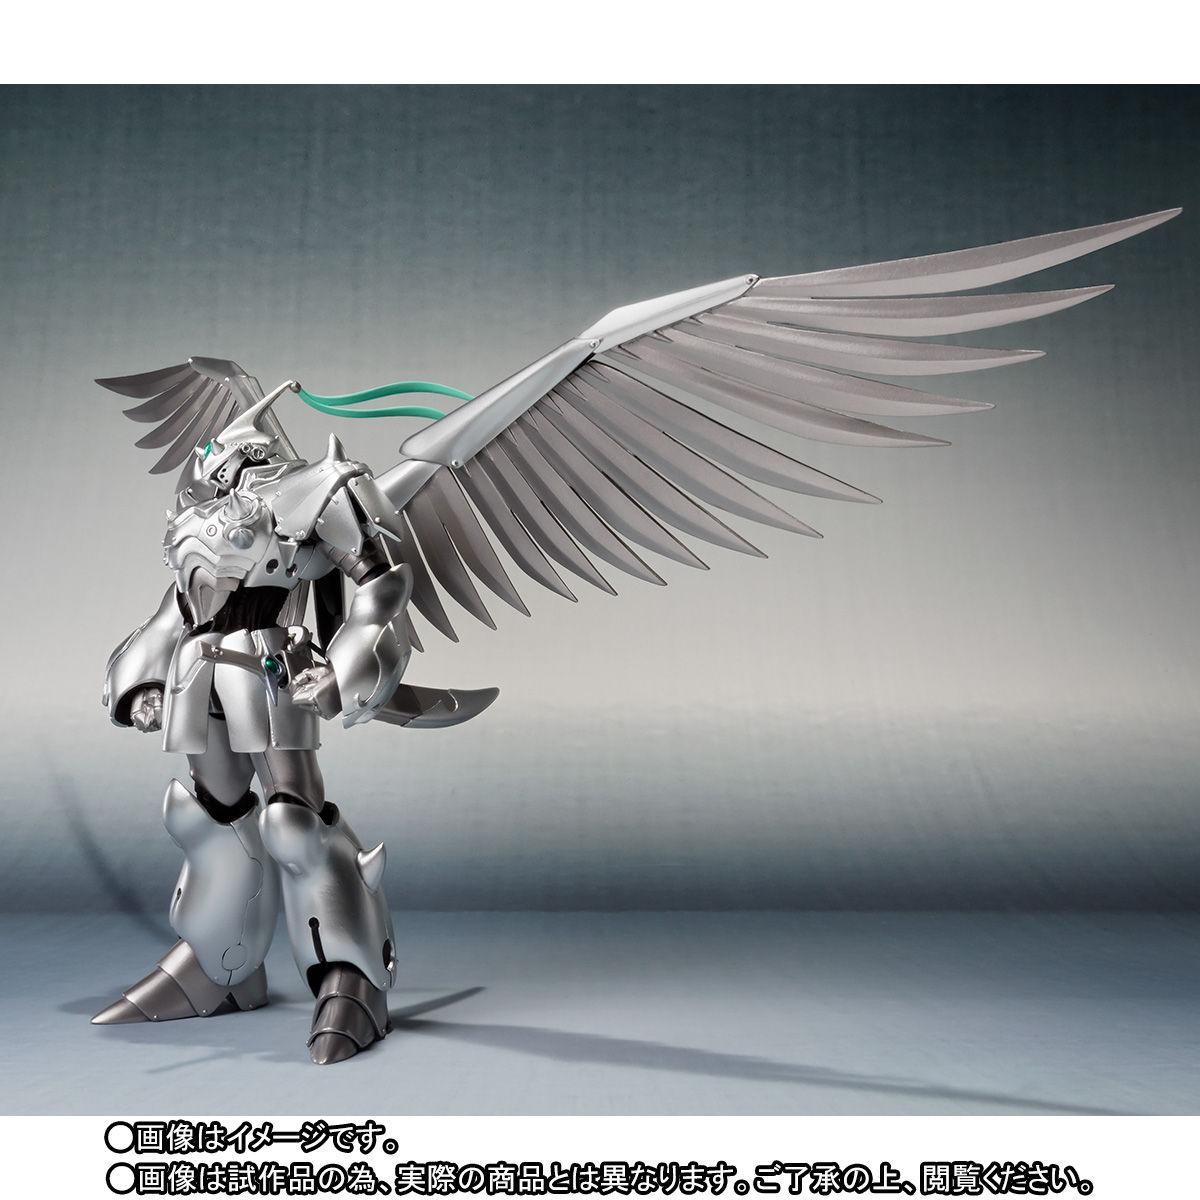 ROBOT魂〈SIDE PB〉『飛甲兵』機甲界ガリアン 鉄の紋章 可動フィギュア-009